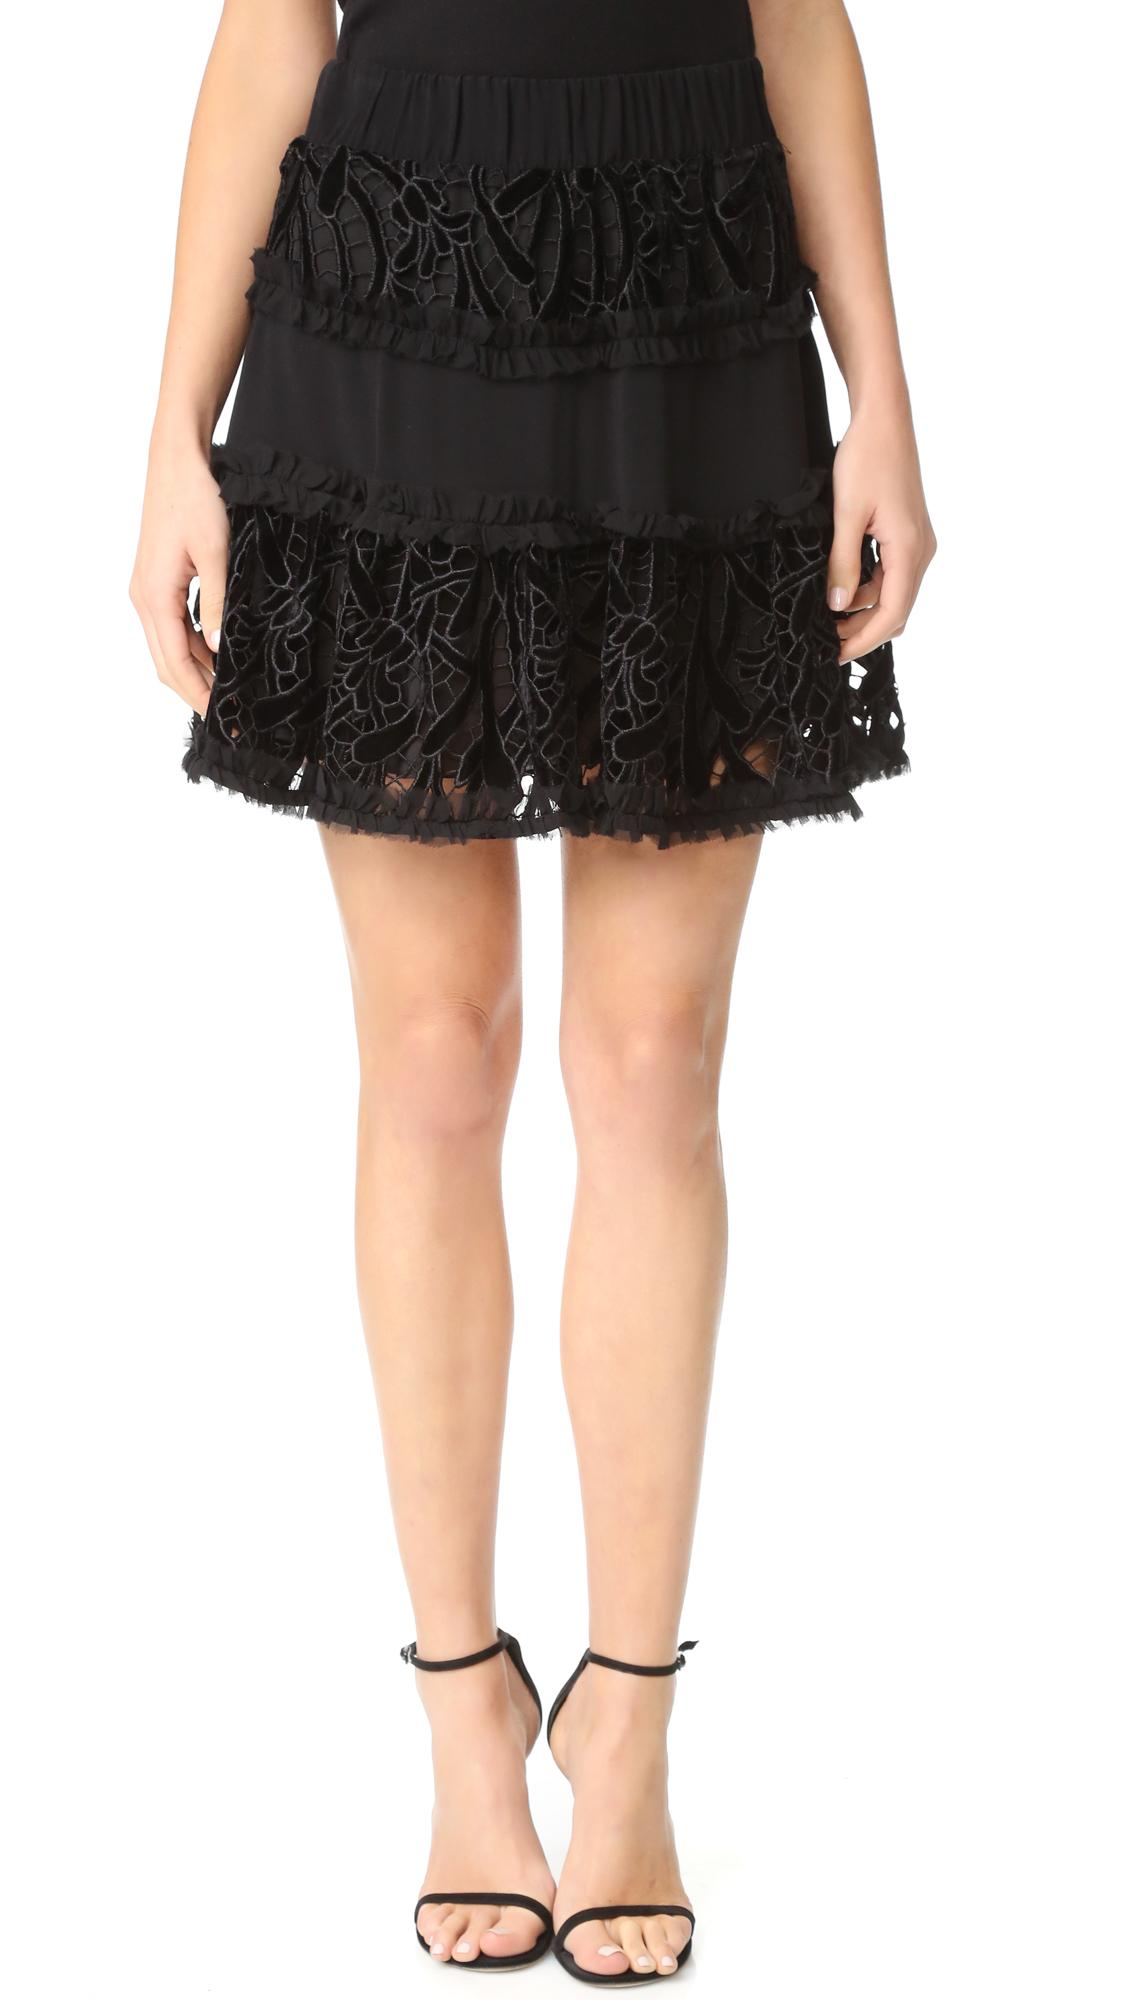 Alexis Antonina Skirt - Black at Shopbop